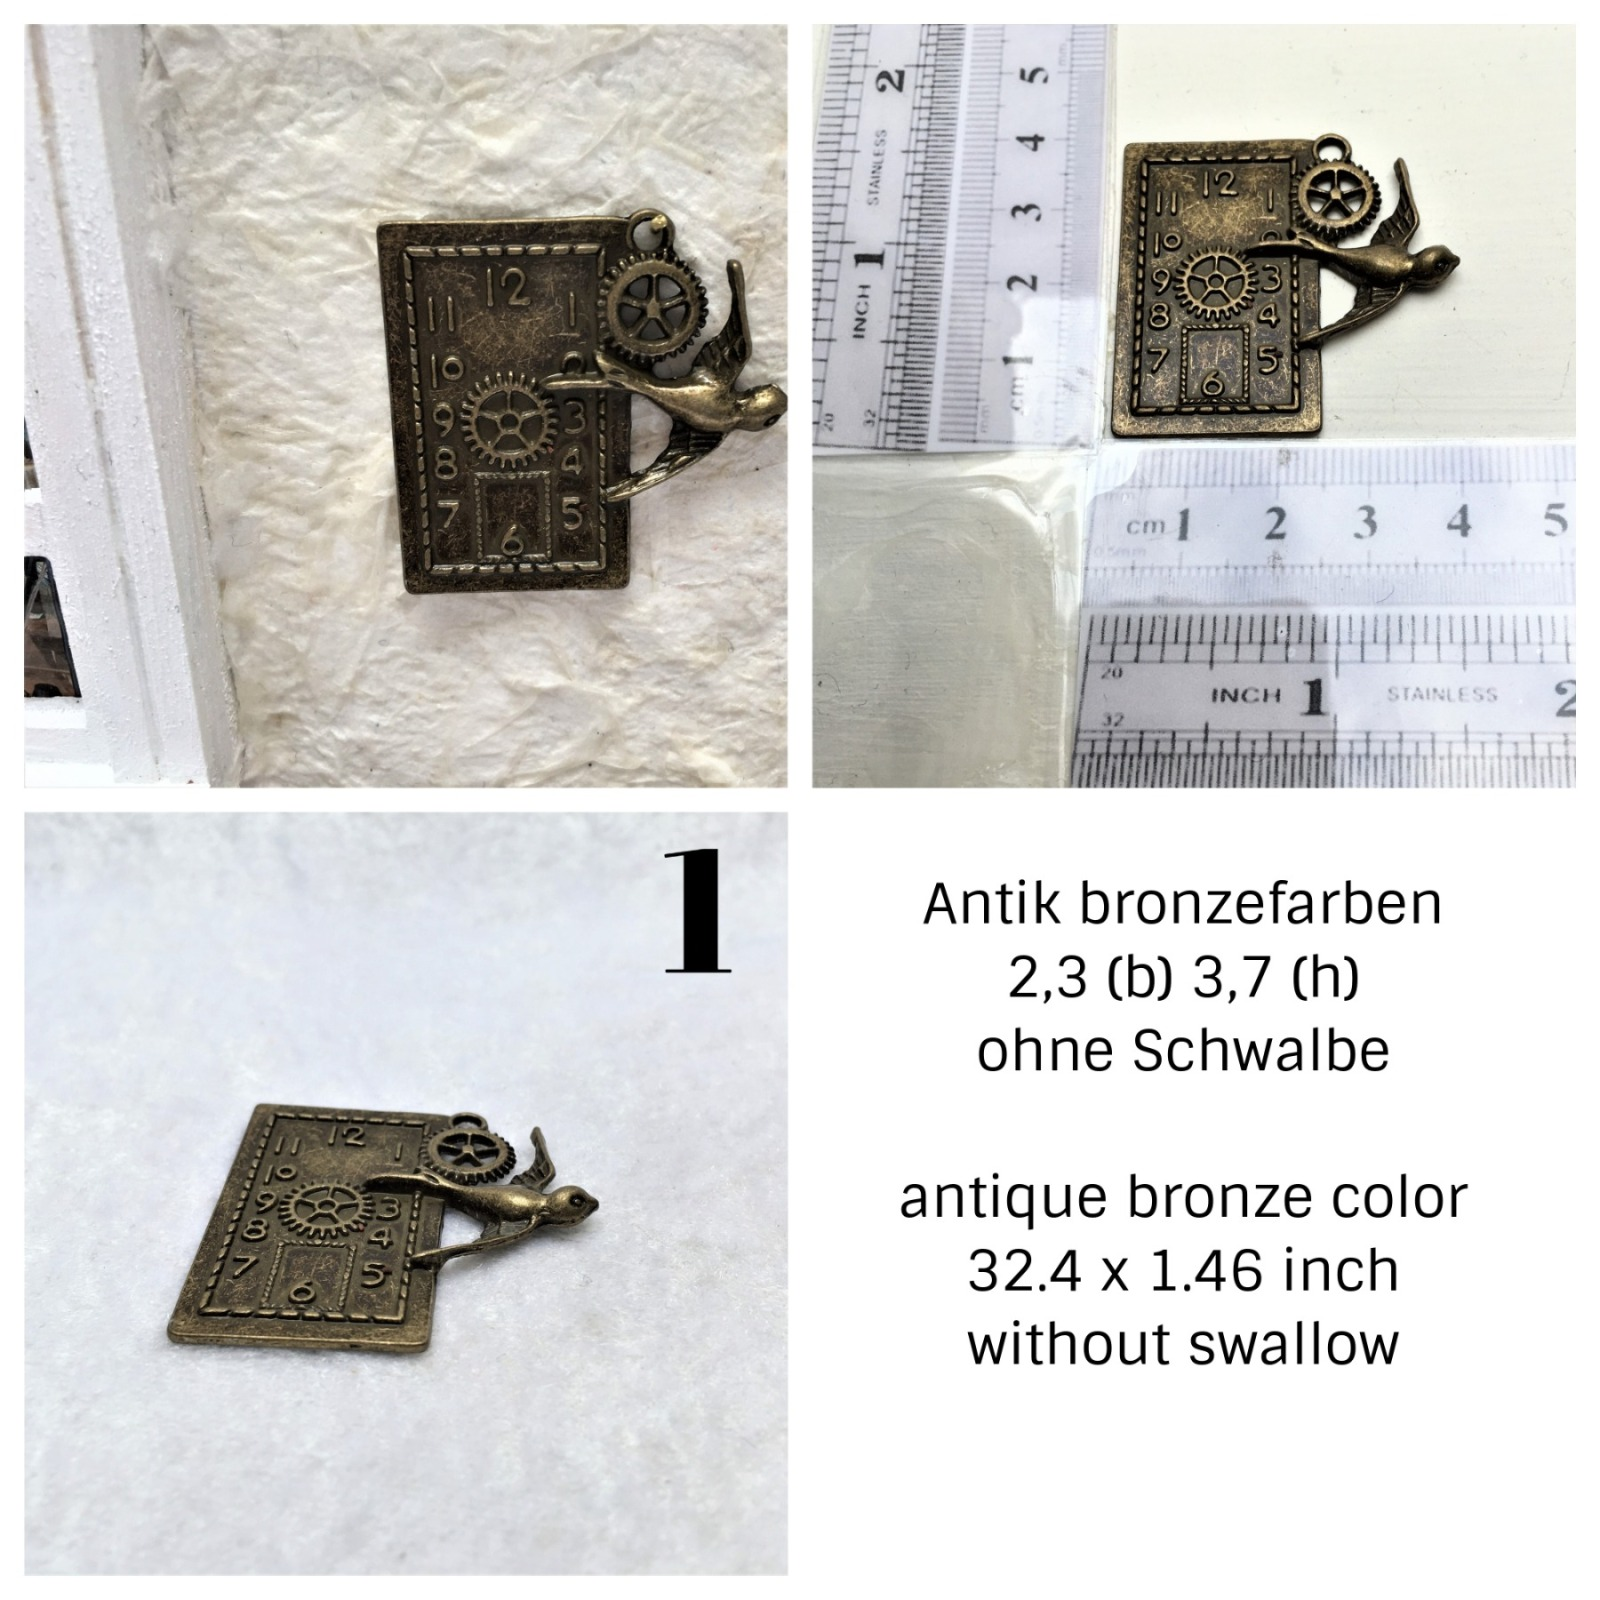 Uhren antik Bronzefarben